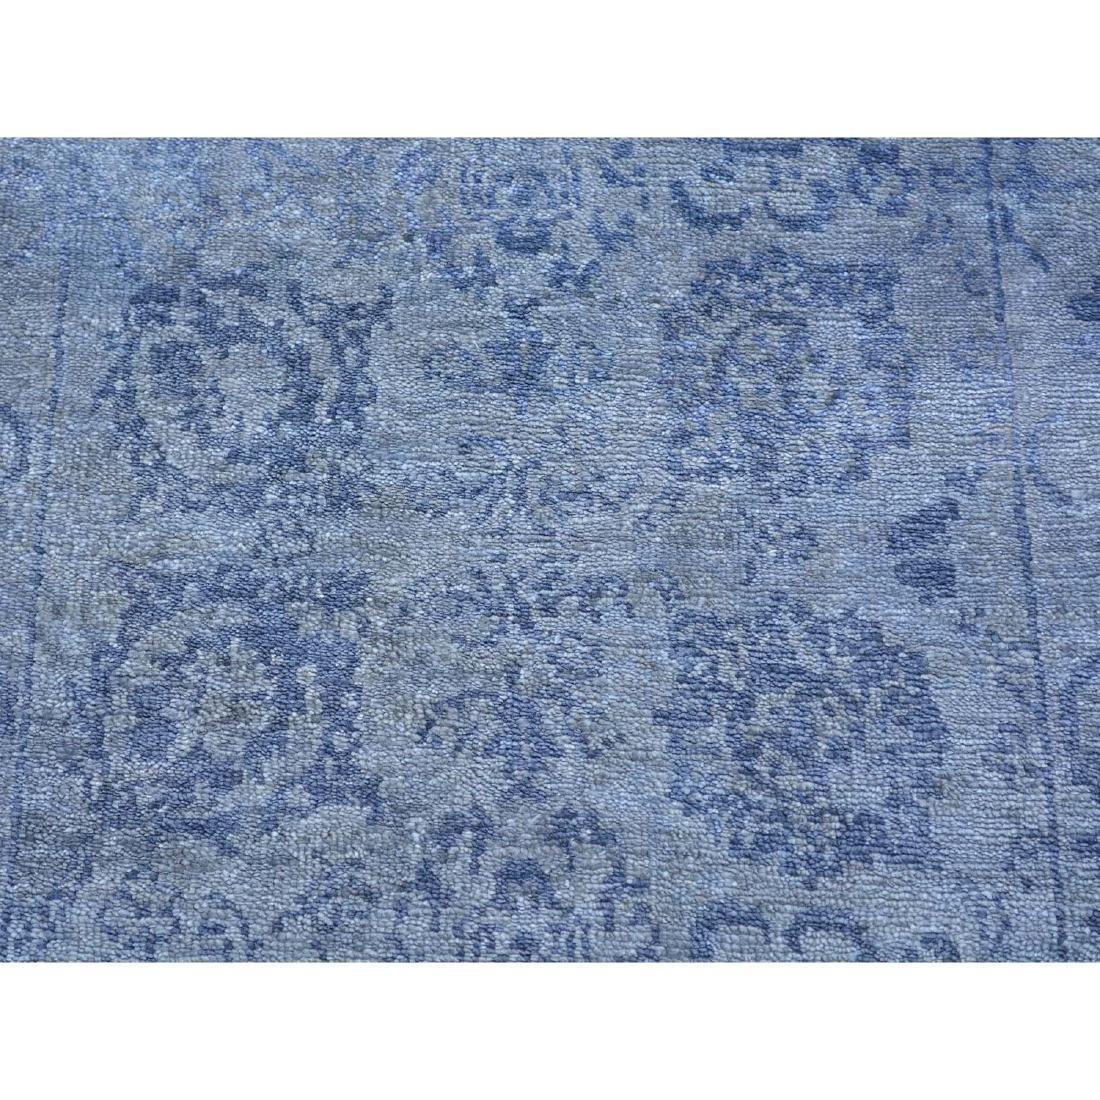 Runner Wool and Silk Tone on Tone Tabriz Handmade Rug - 4